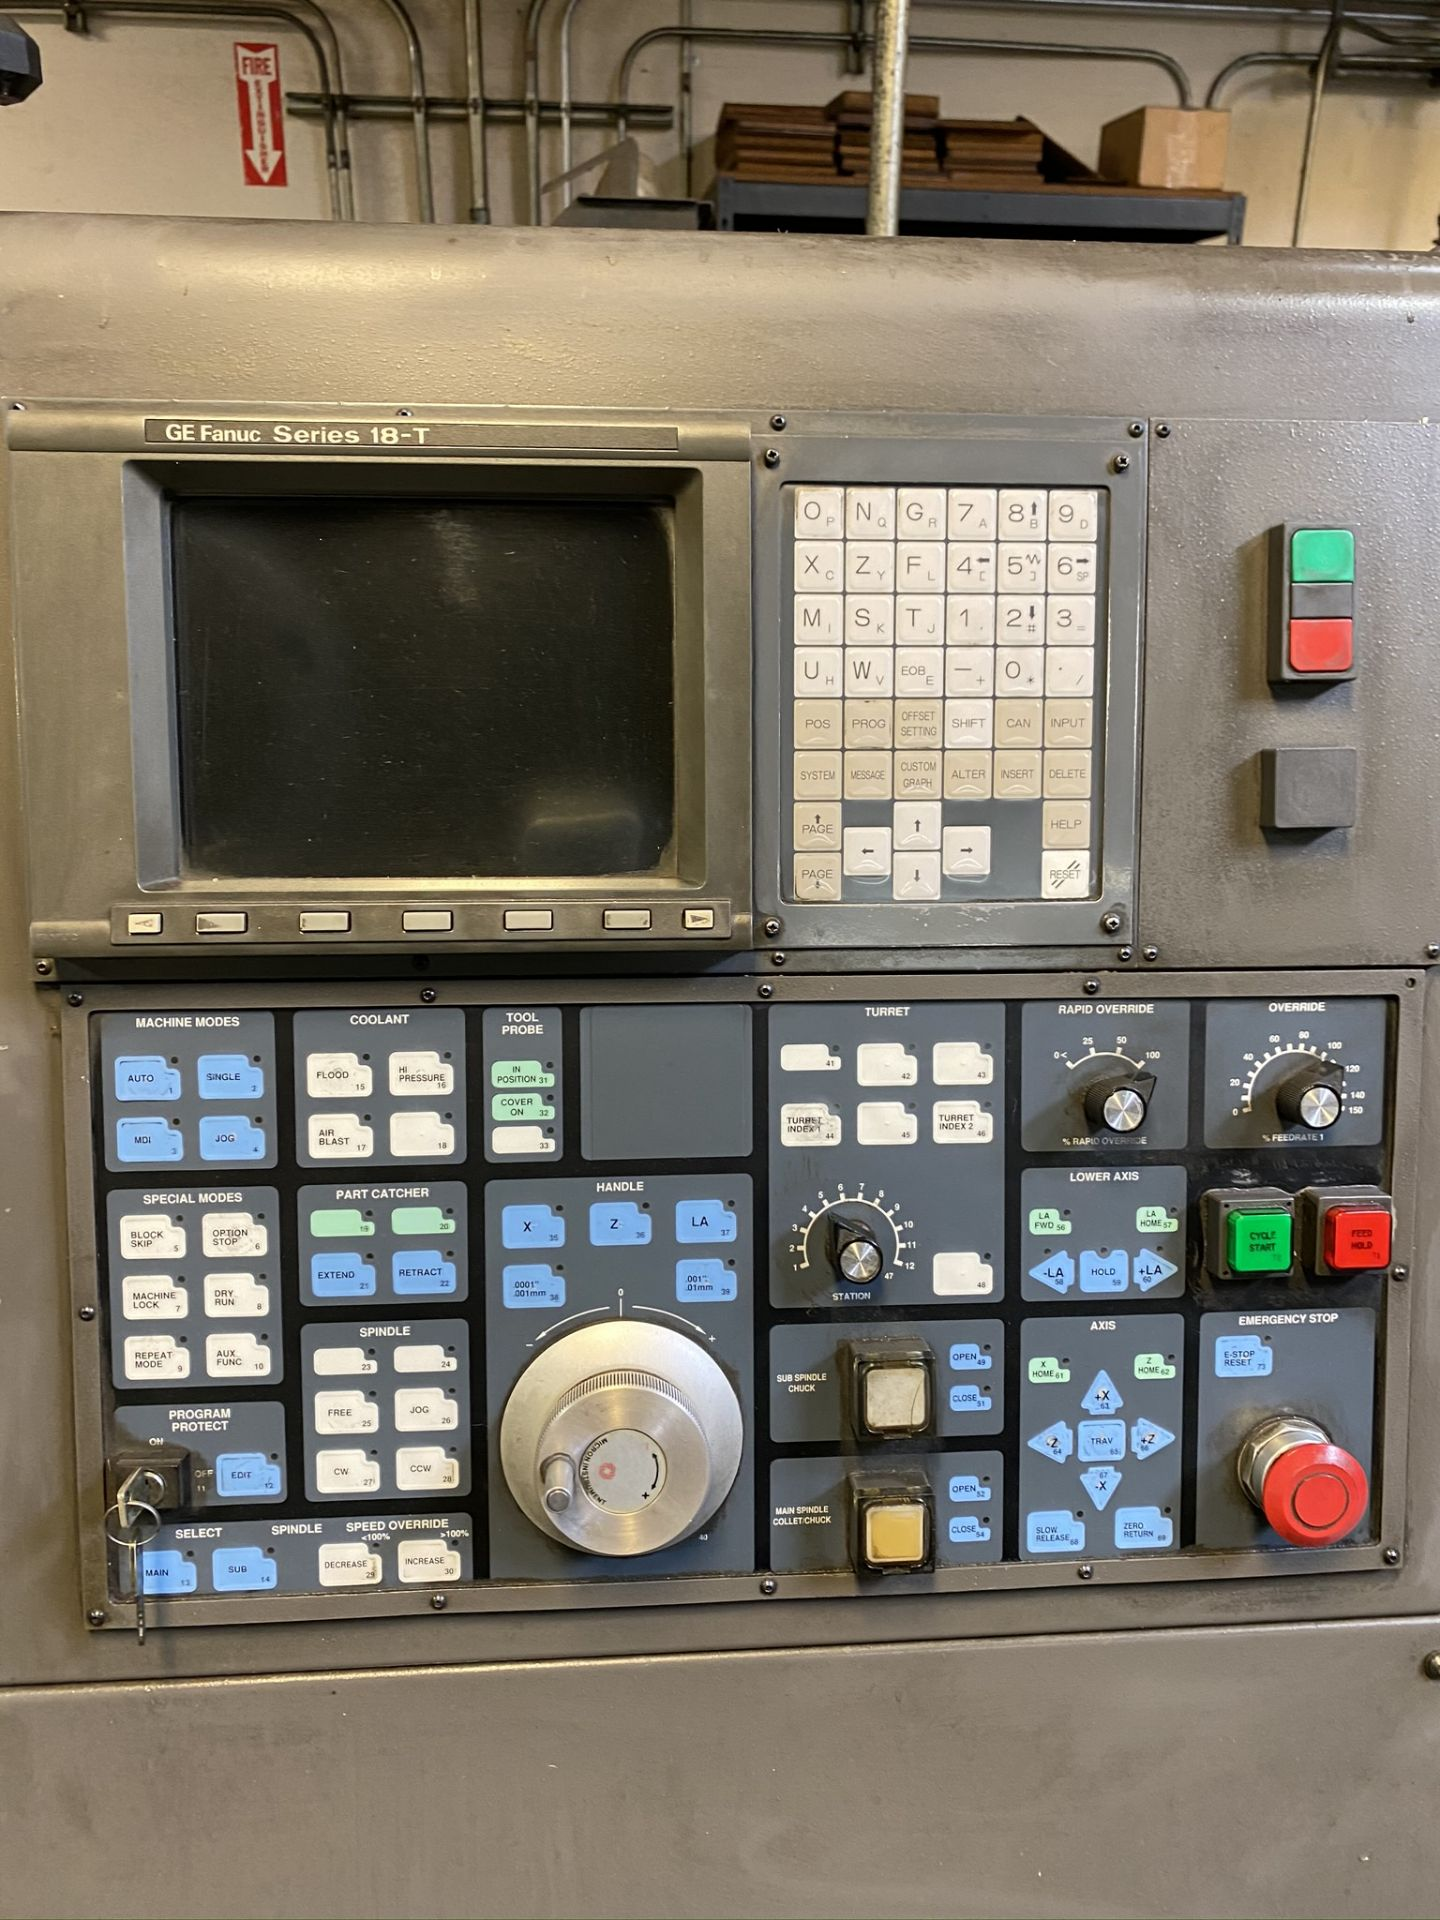 HARDINGE CONQUEST T-42 CNC LATHE, MODEL SG42, FANUC 18-T CNC CONTROL, 12-STATION TURRET, - Image 20 of 27